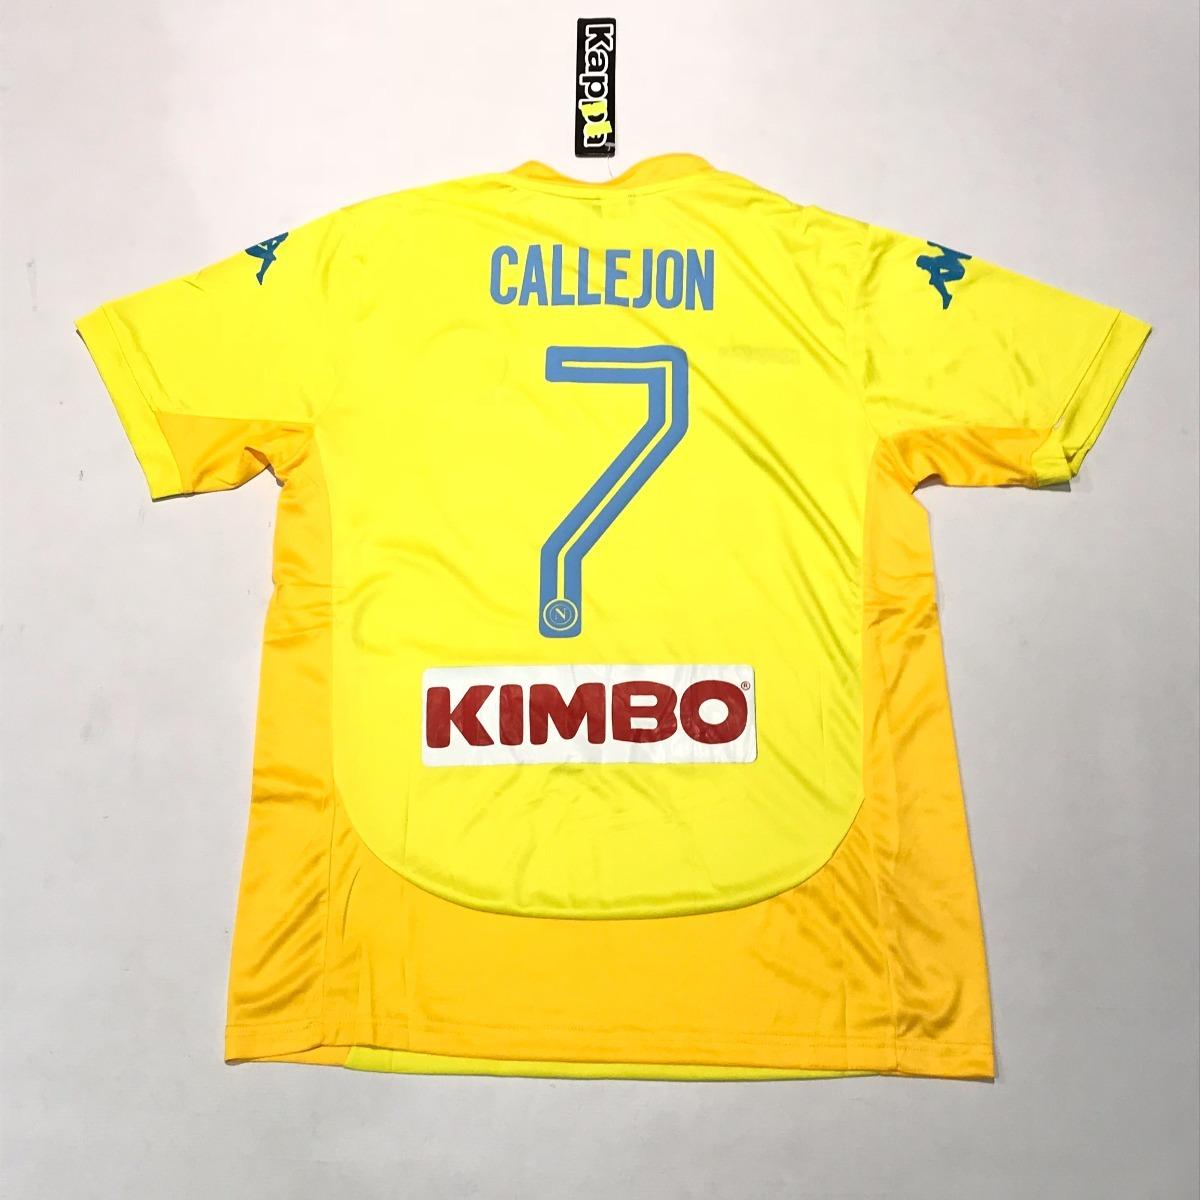 camiseta de napoli kappa amarilla talle m  7 callejon. Cargando zoom. ece8a7e3c29c5